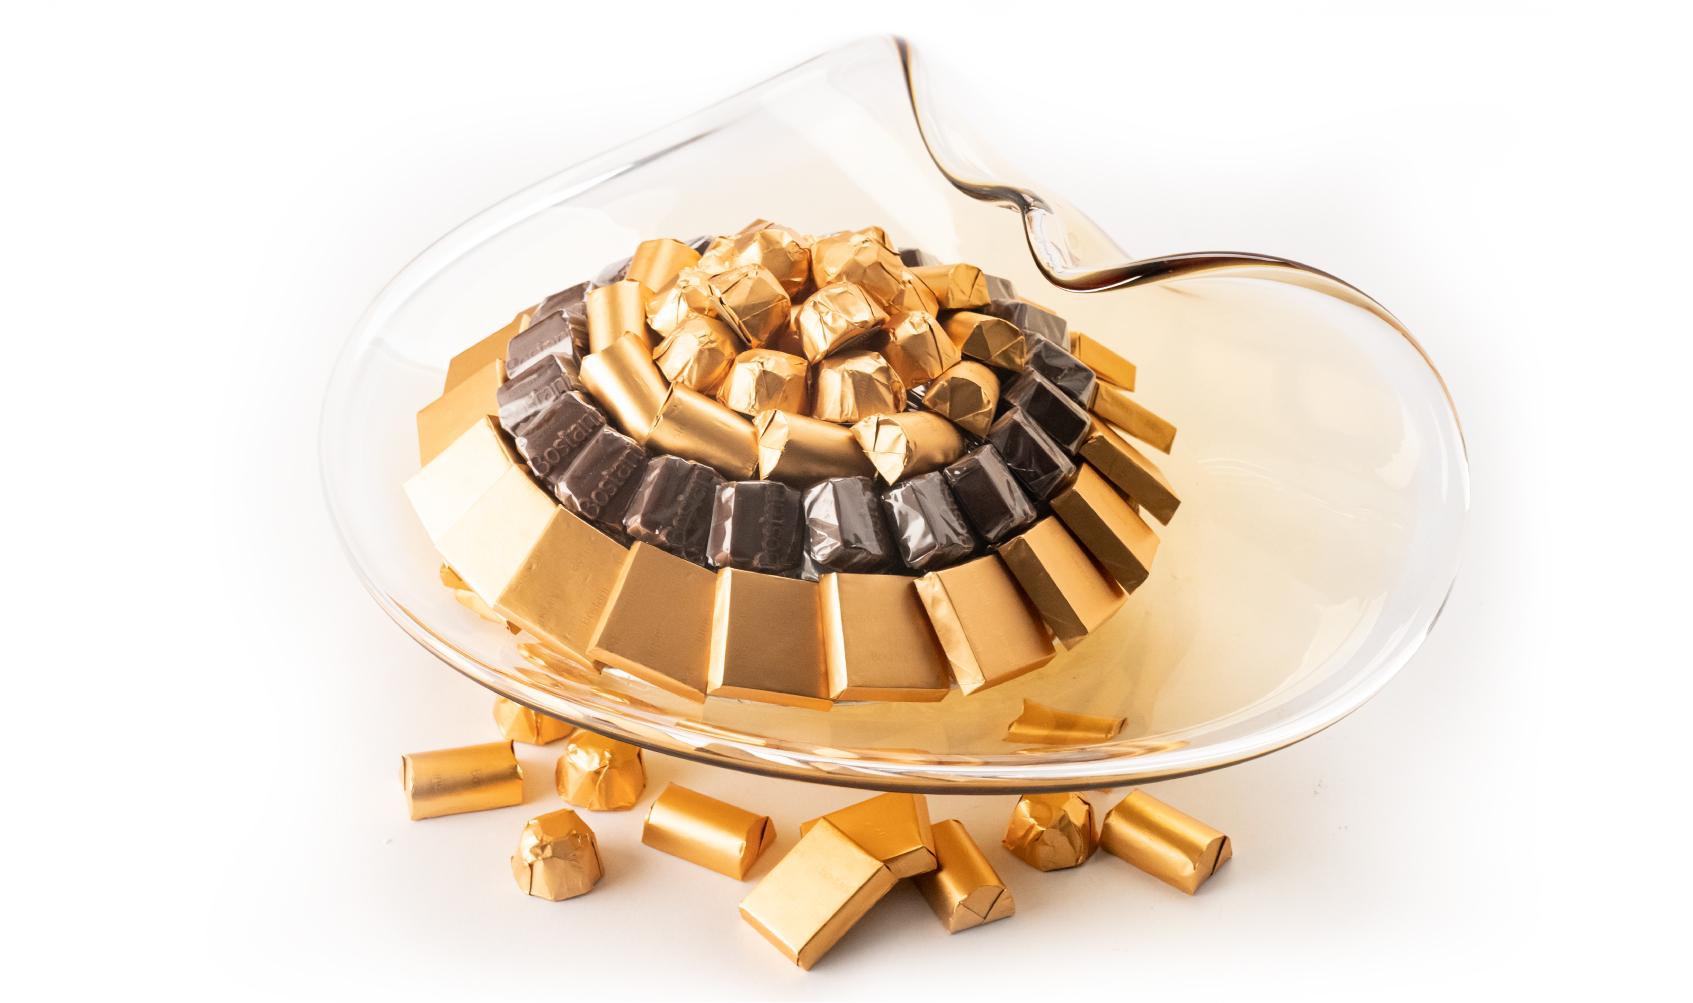 Mix Chocolate Curvy Italian Handmade Dish